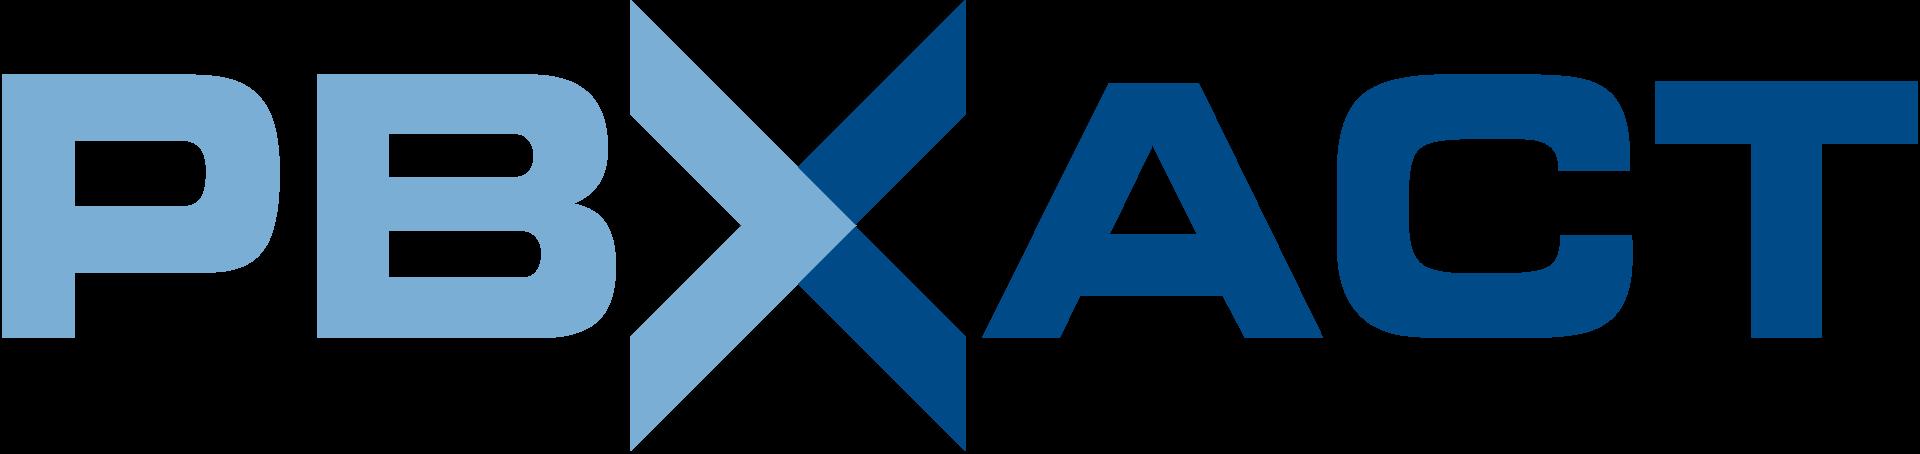 PBXact Distribute by Nuvola Distribution